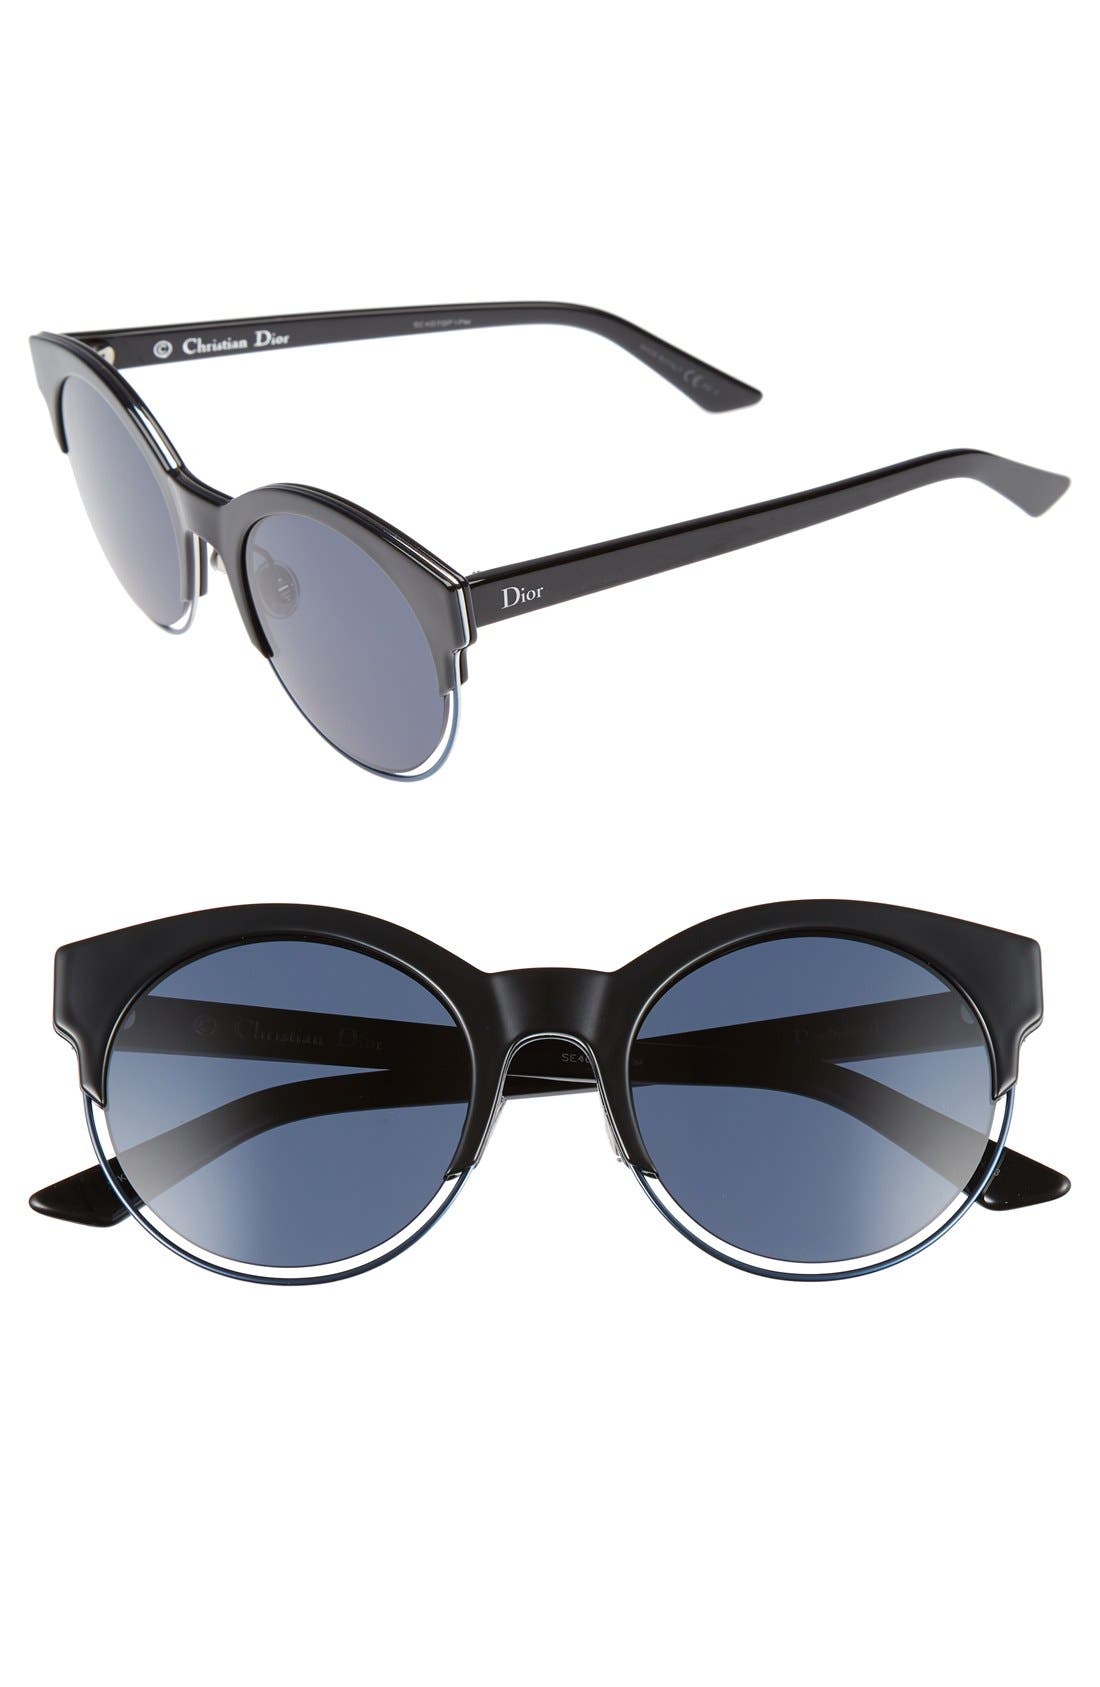 Dior Siderall 1 53mm Round Sunglasses